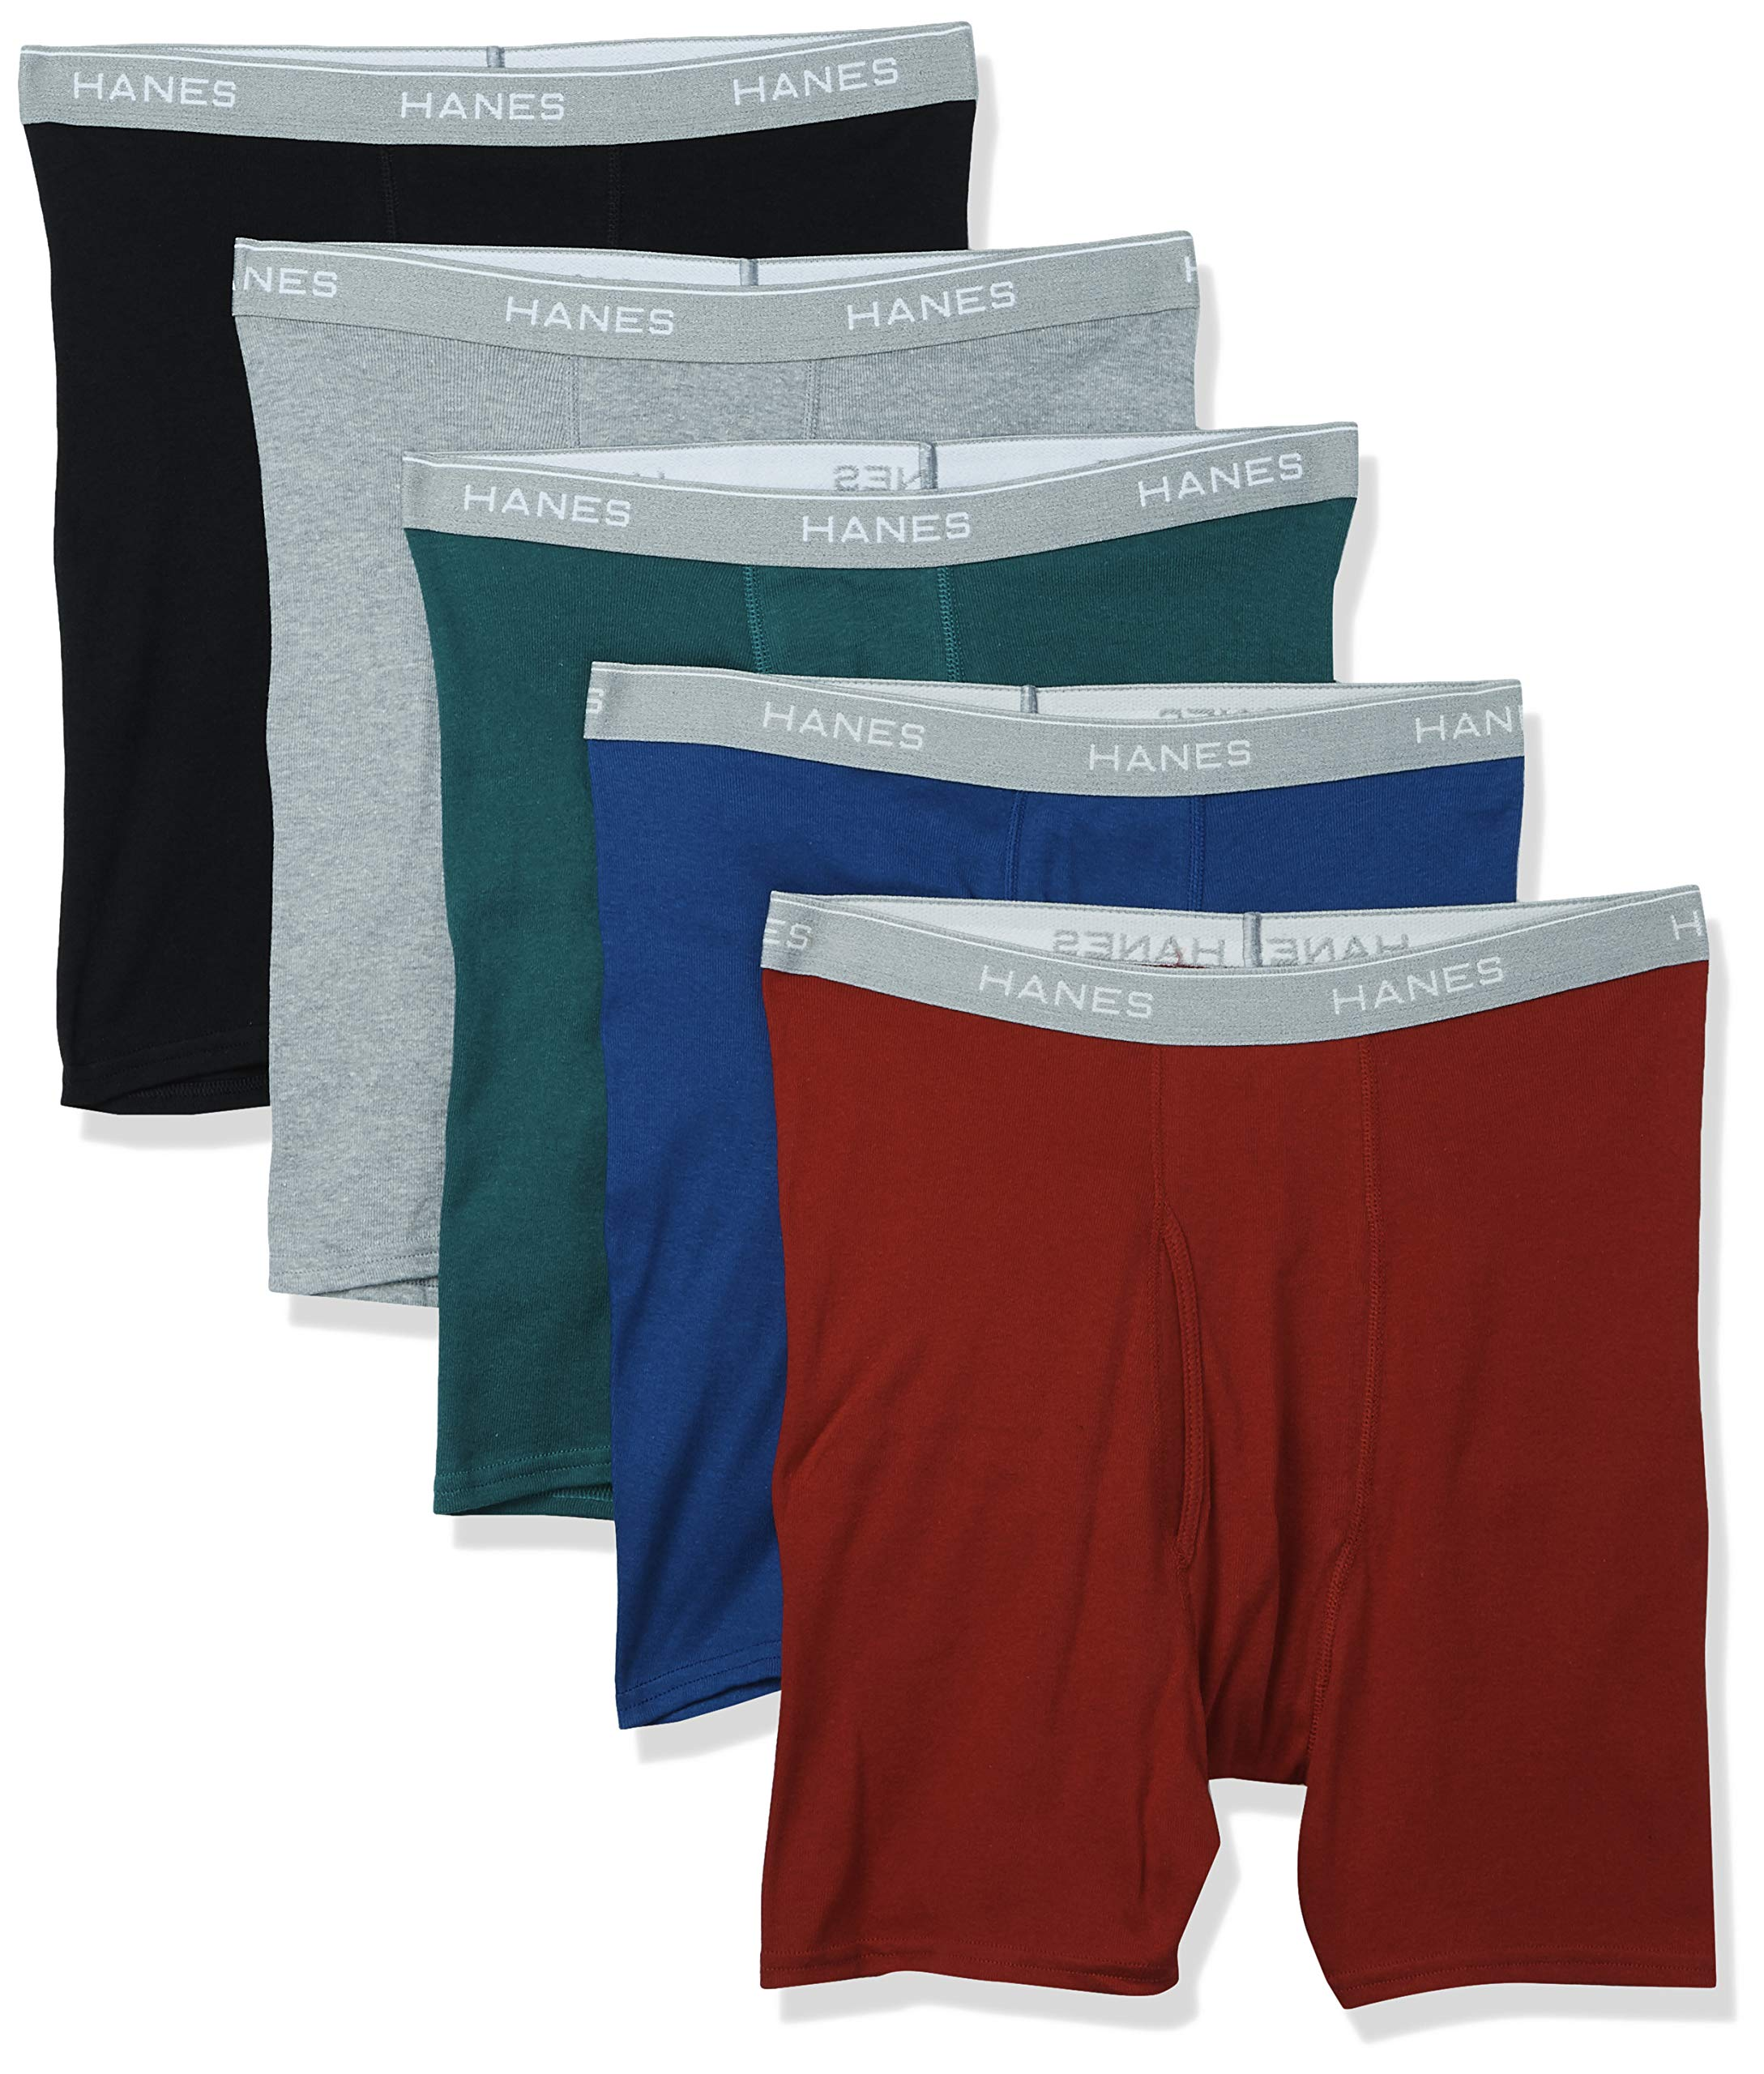 Men's Boxer Briefs (Pack of 10)